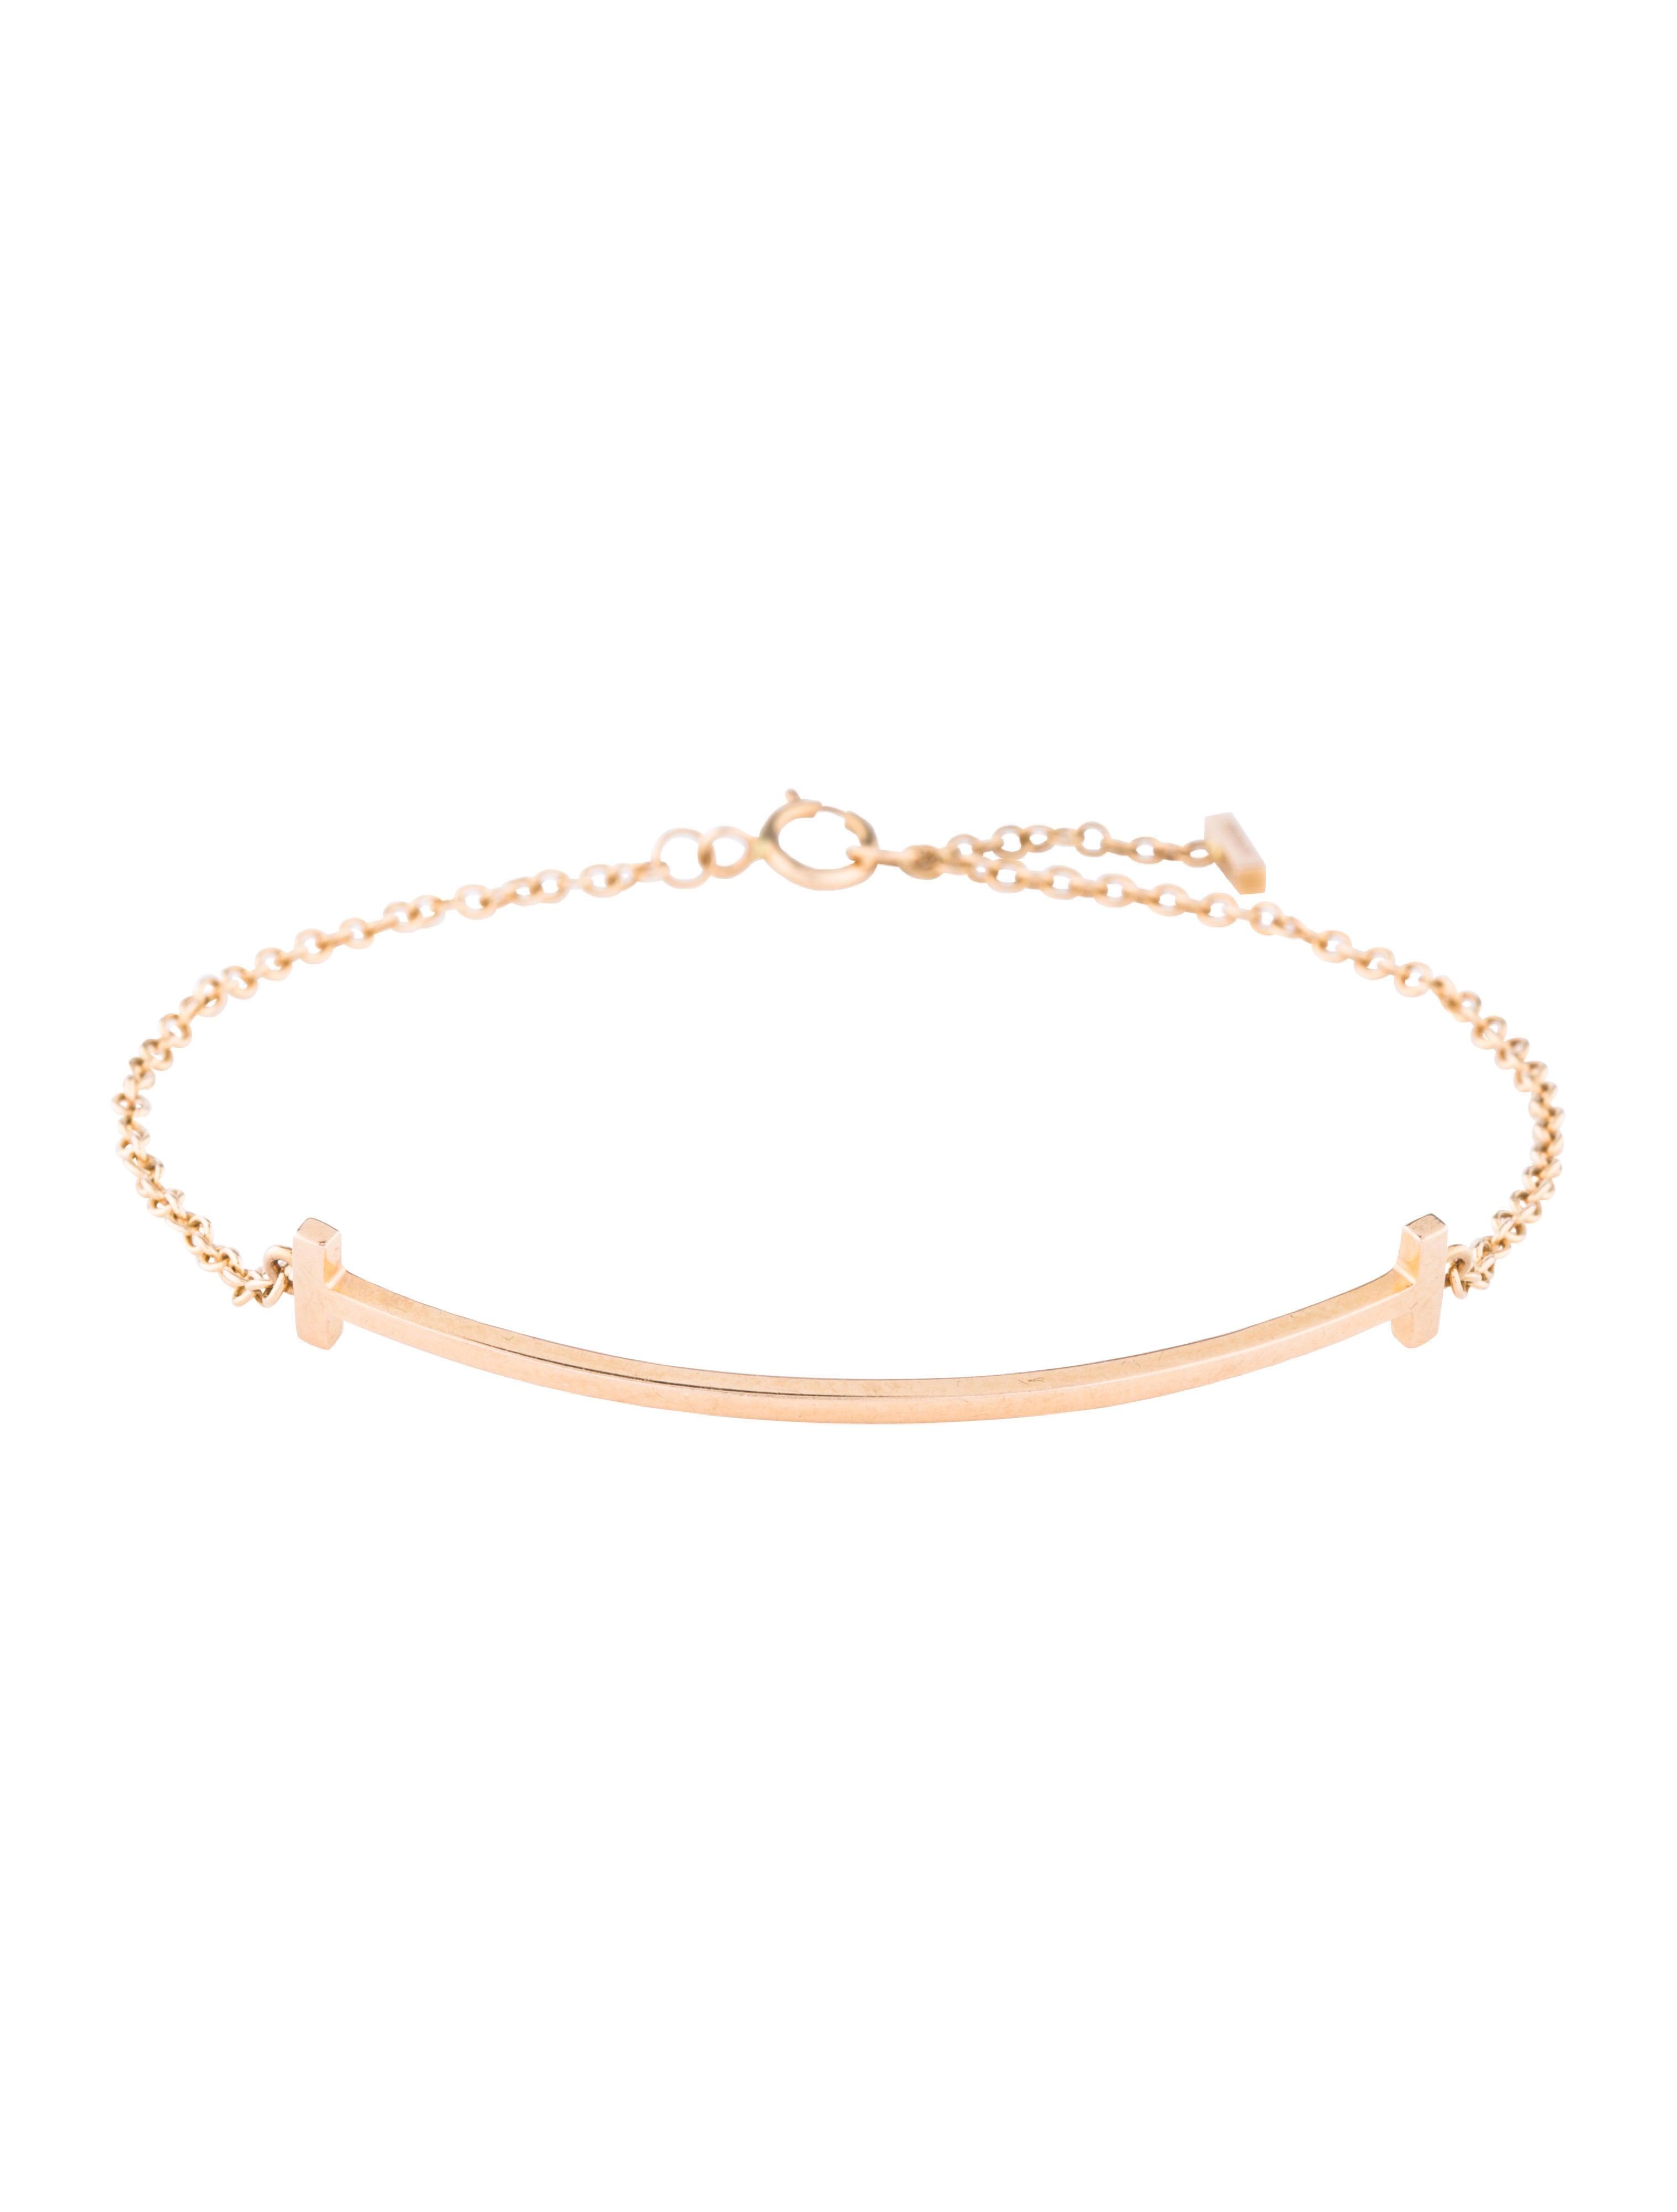 d4882bf59 Tiffany & Co. 18K T Smile Bracelet - Bracelets - TIF77628 | The RealReal